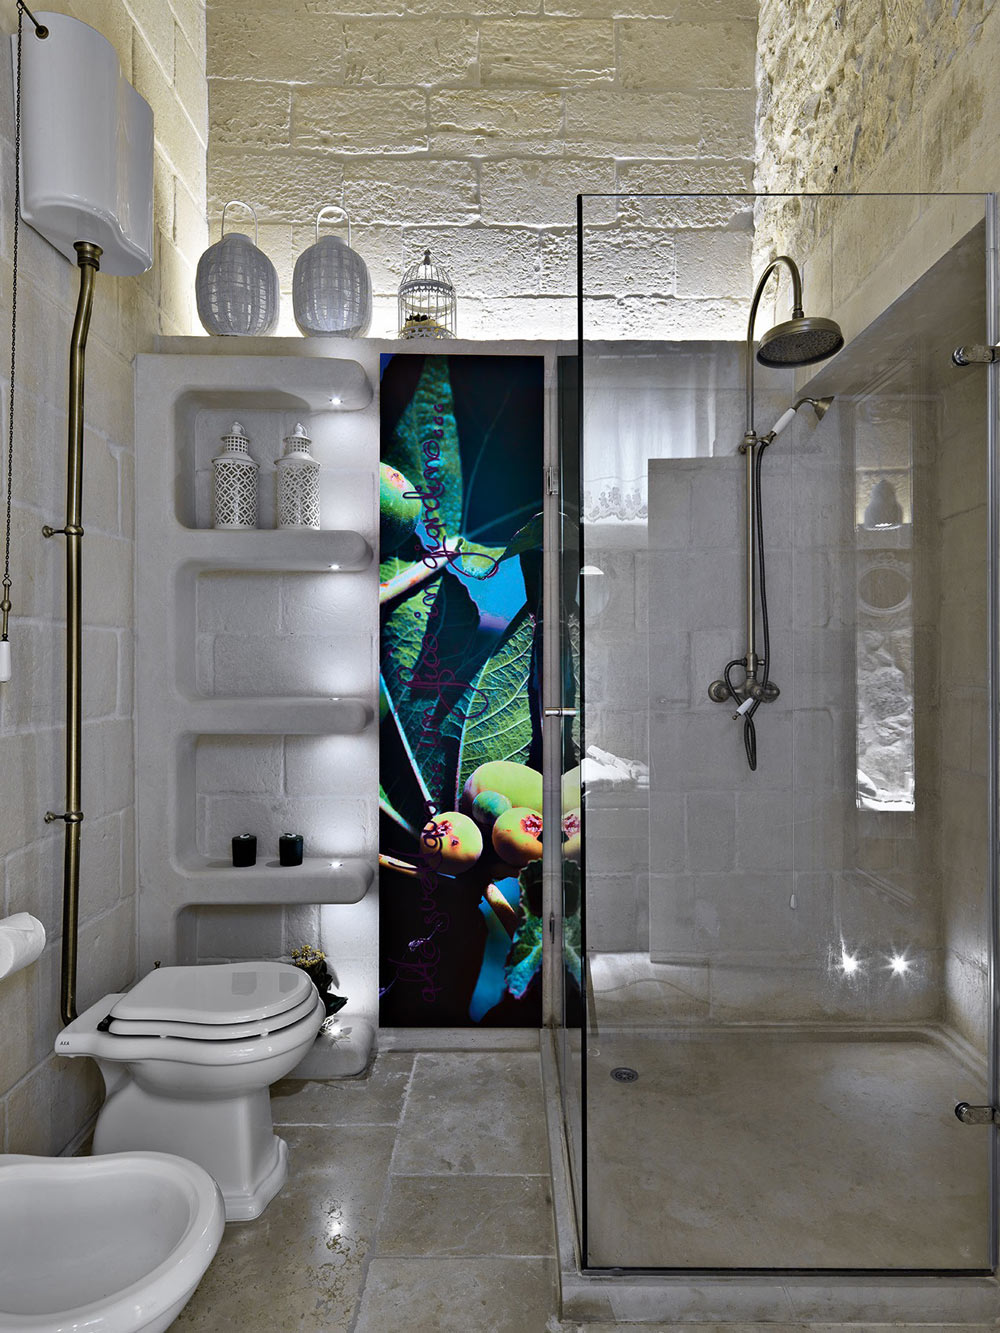 Glass Shower, Art, Relais Masseria Capasa Hotel in Martano, Italy